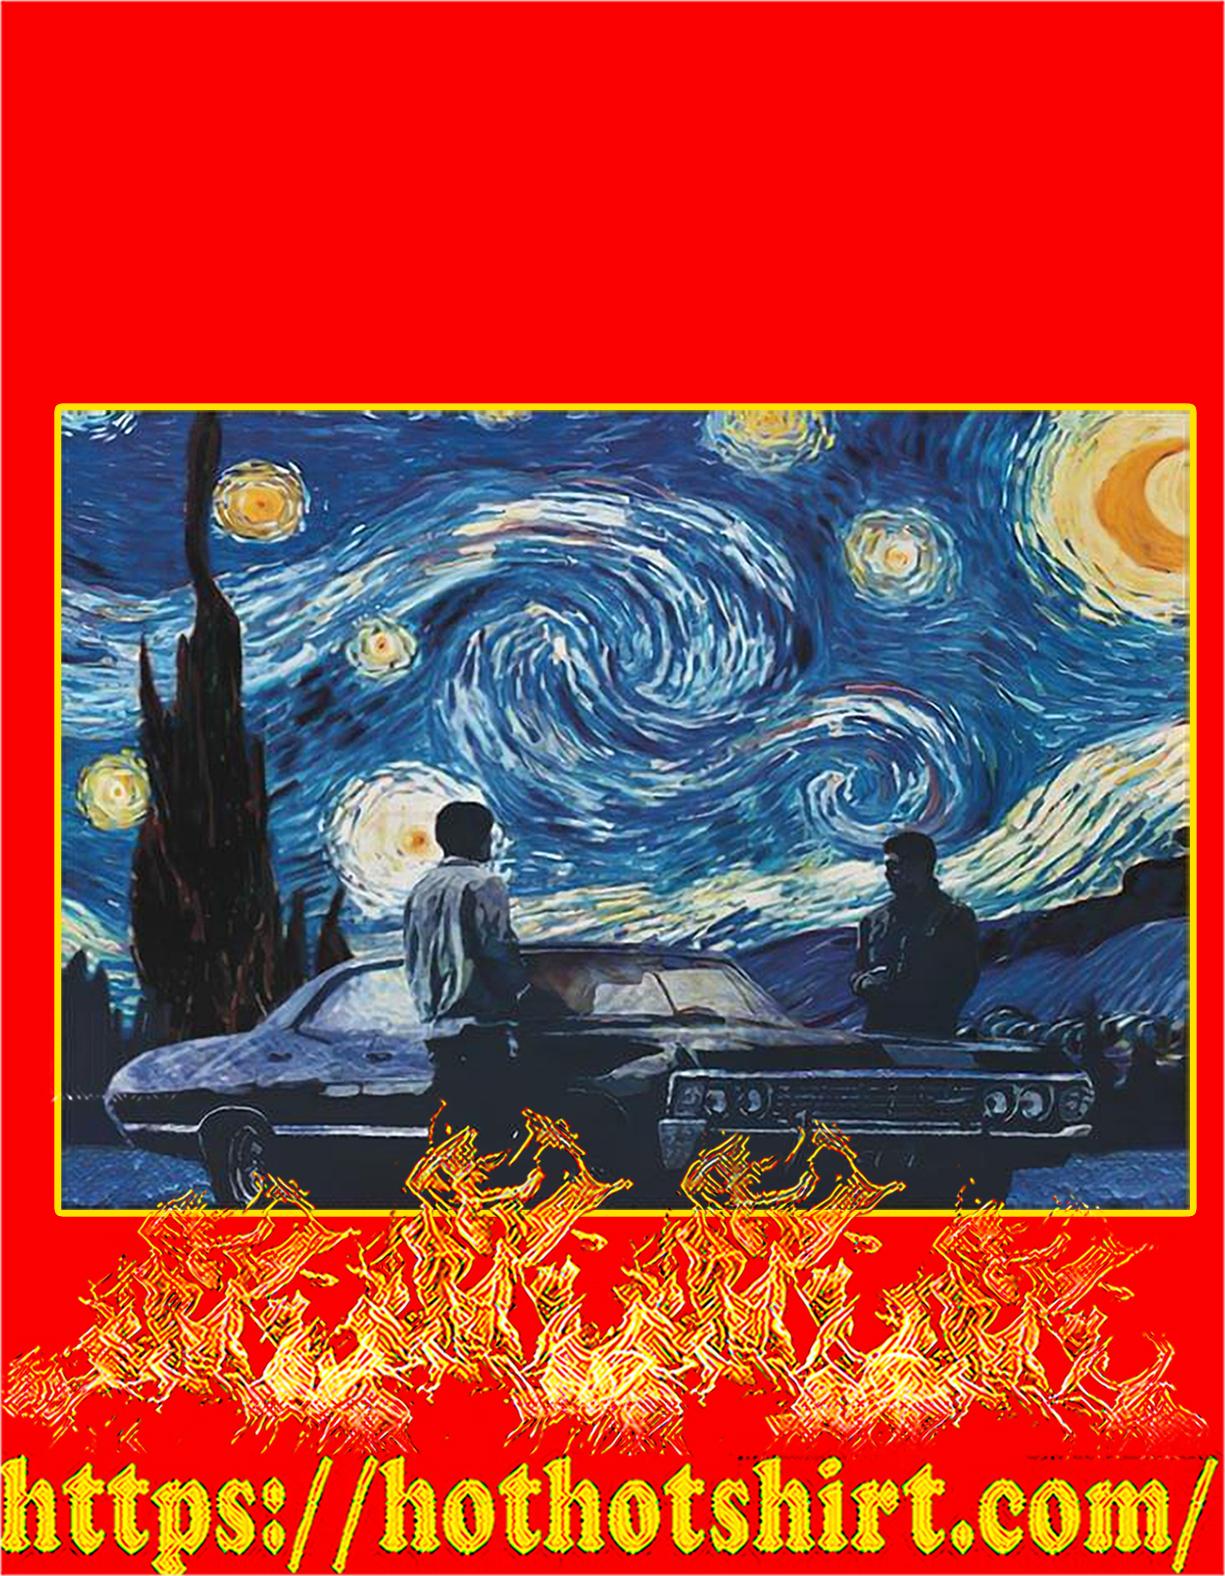 SupernaturaI starry night van gogh poster - A4